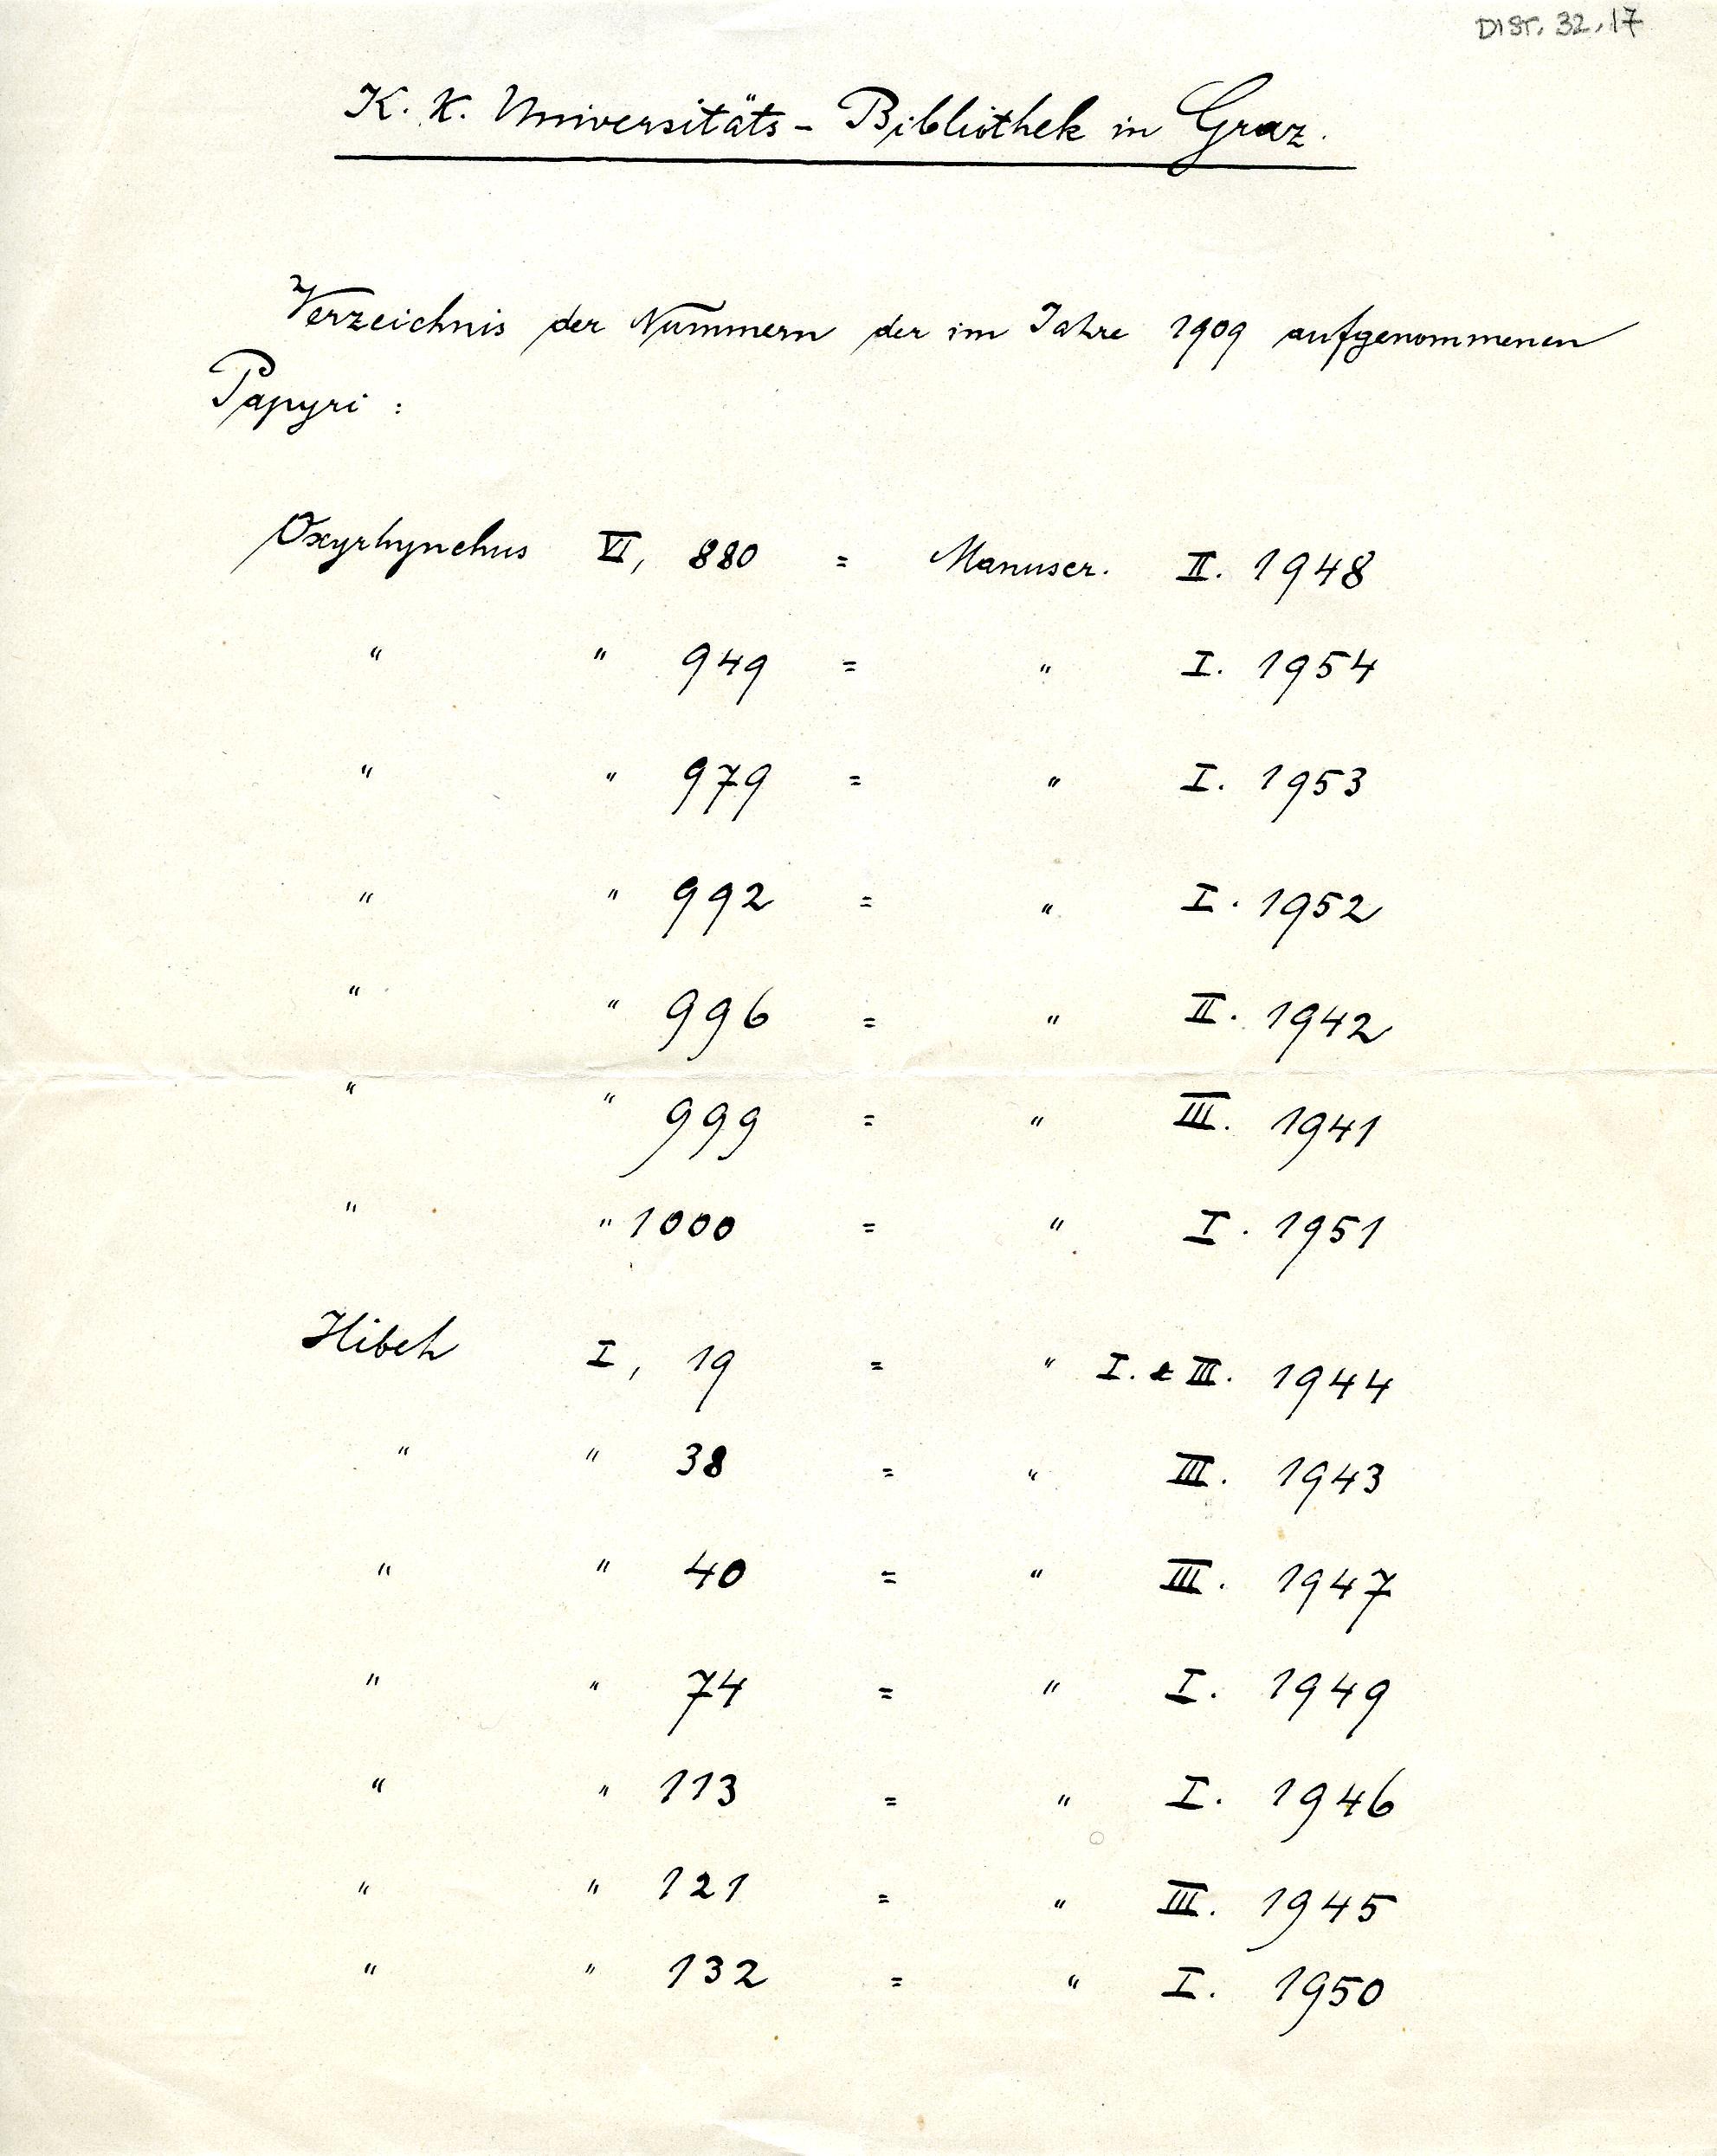 1908-13 Papyri DIST.32.17